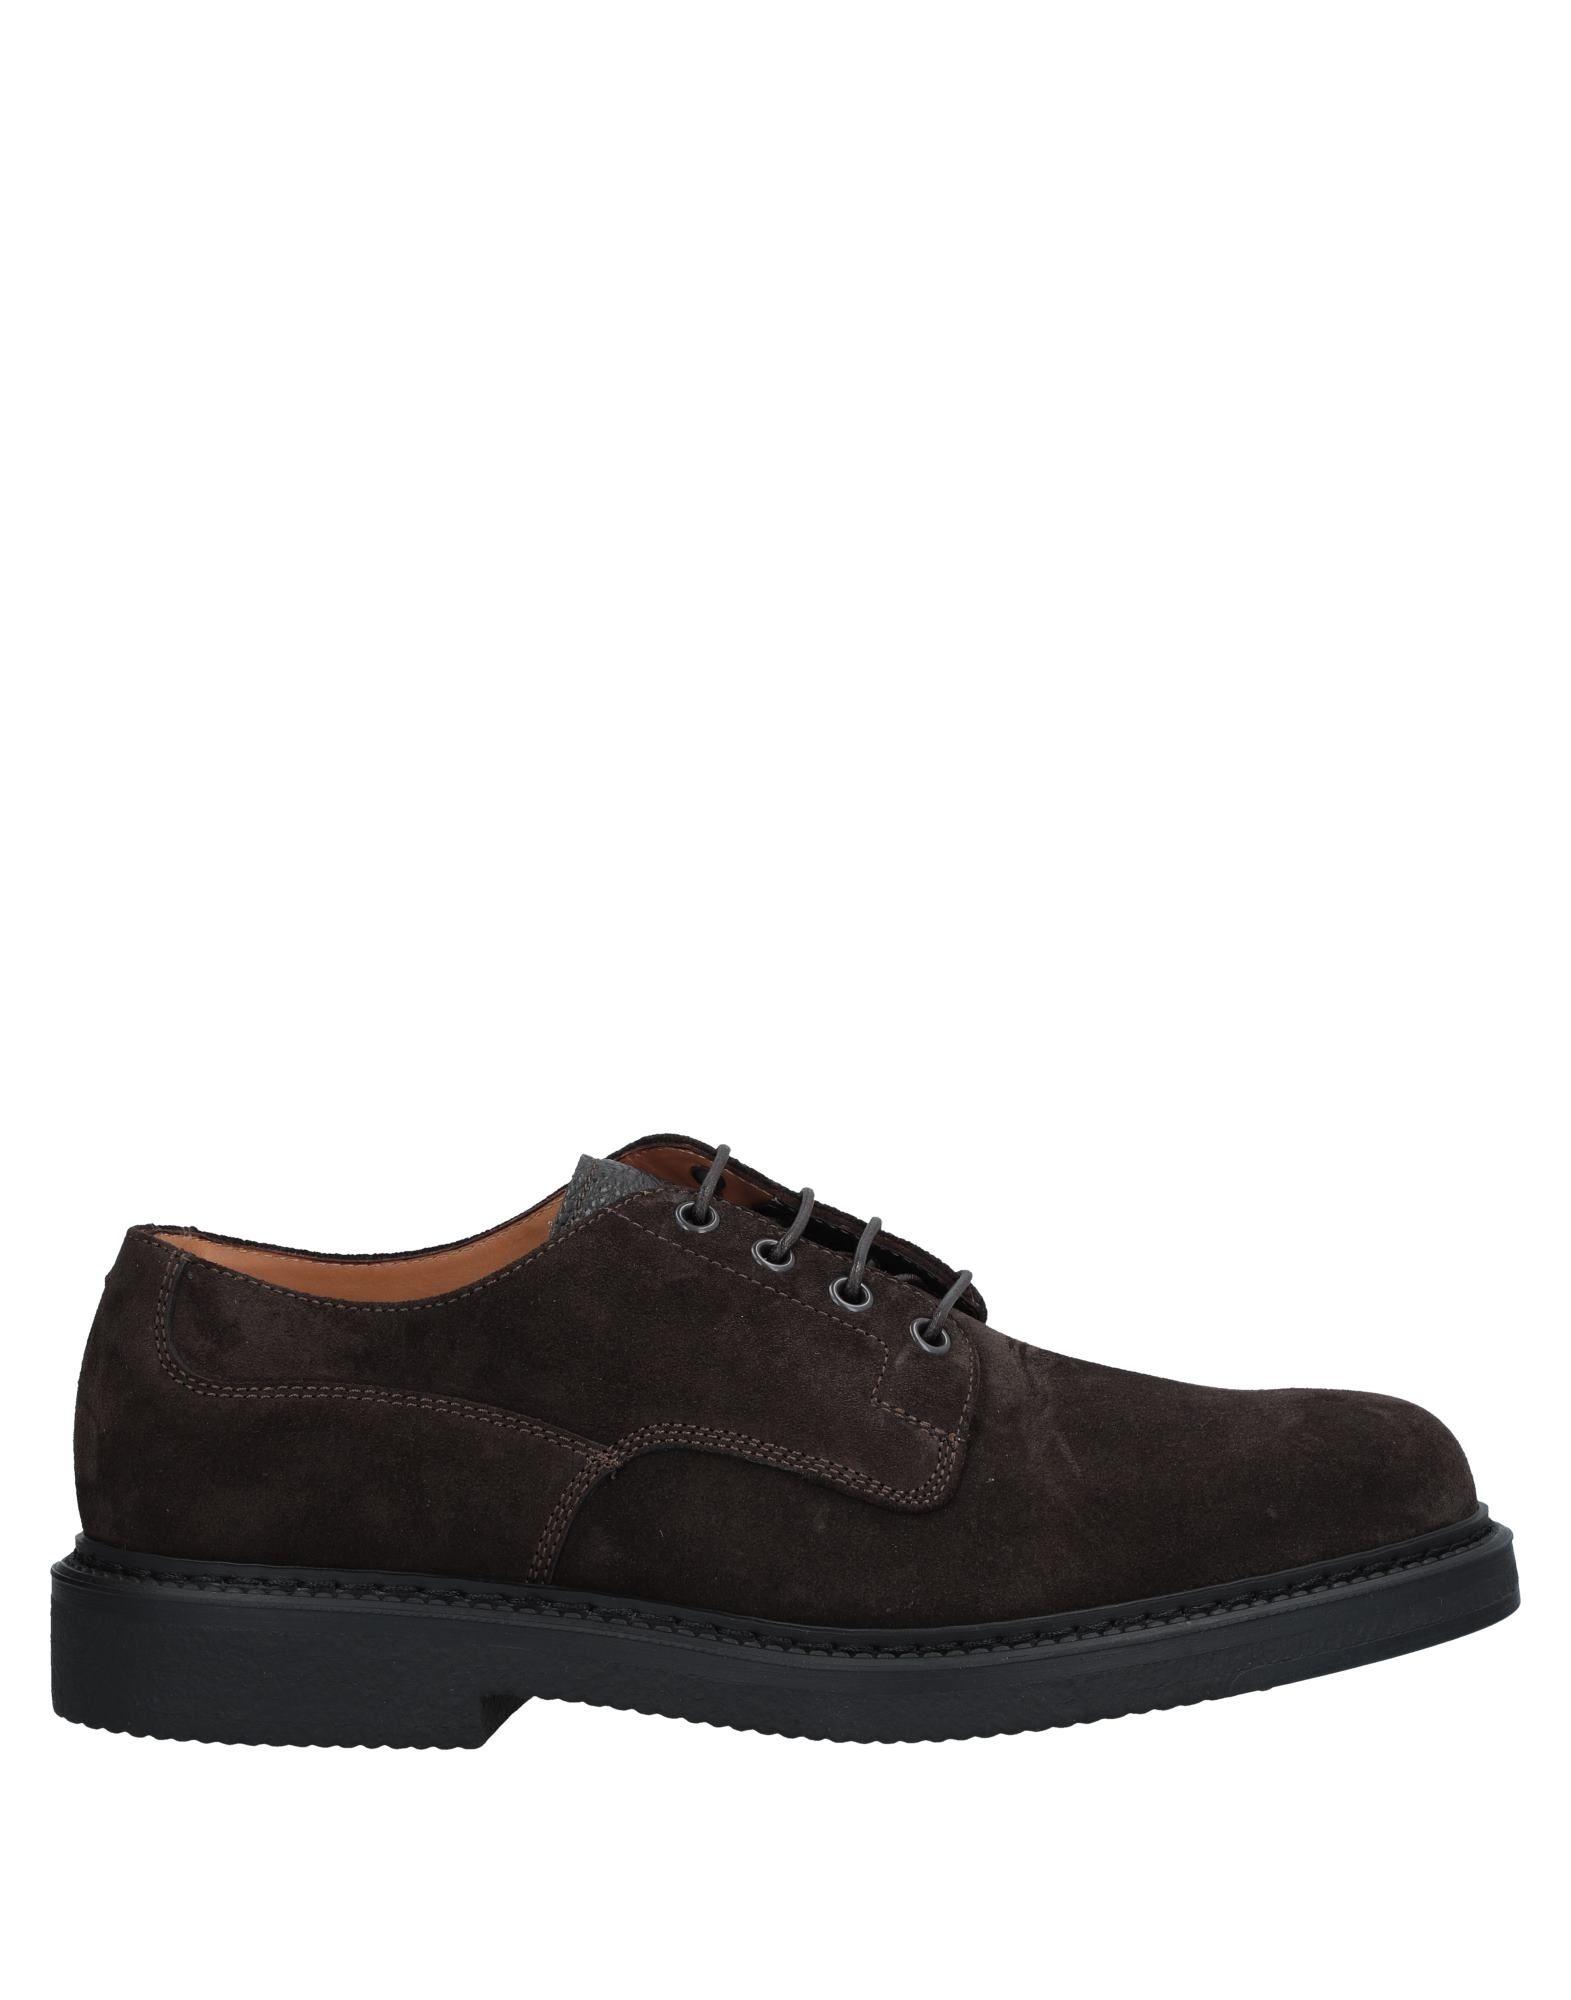 Barracuda Schnürschuhe Herren  11536117OG Gute Qualität beliebte Schuhe